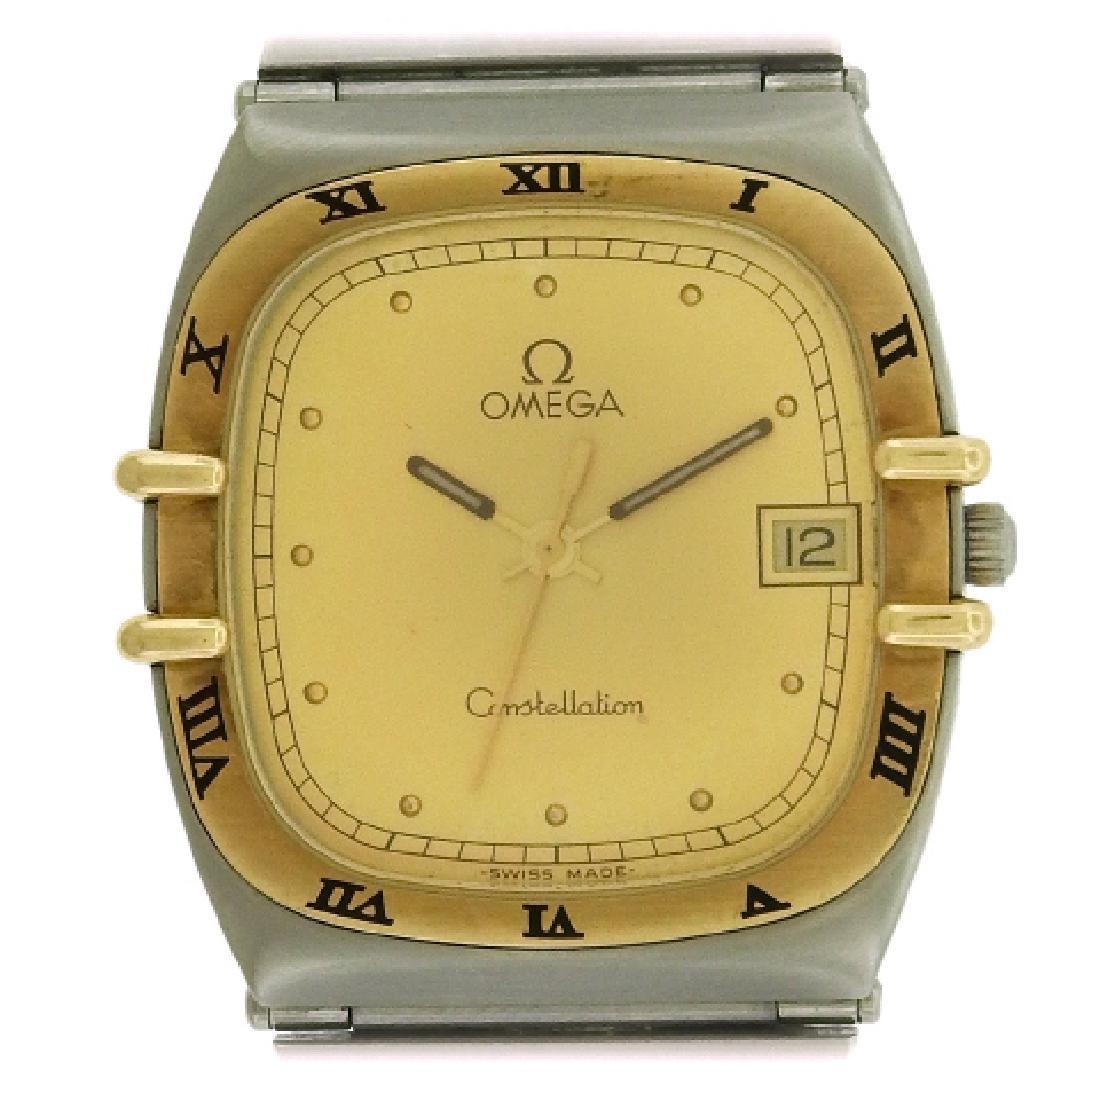 Omega Constellation Two-Tone Quartz Watch